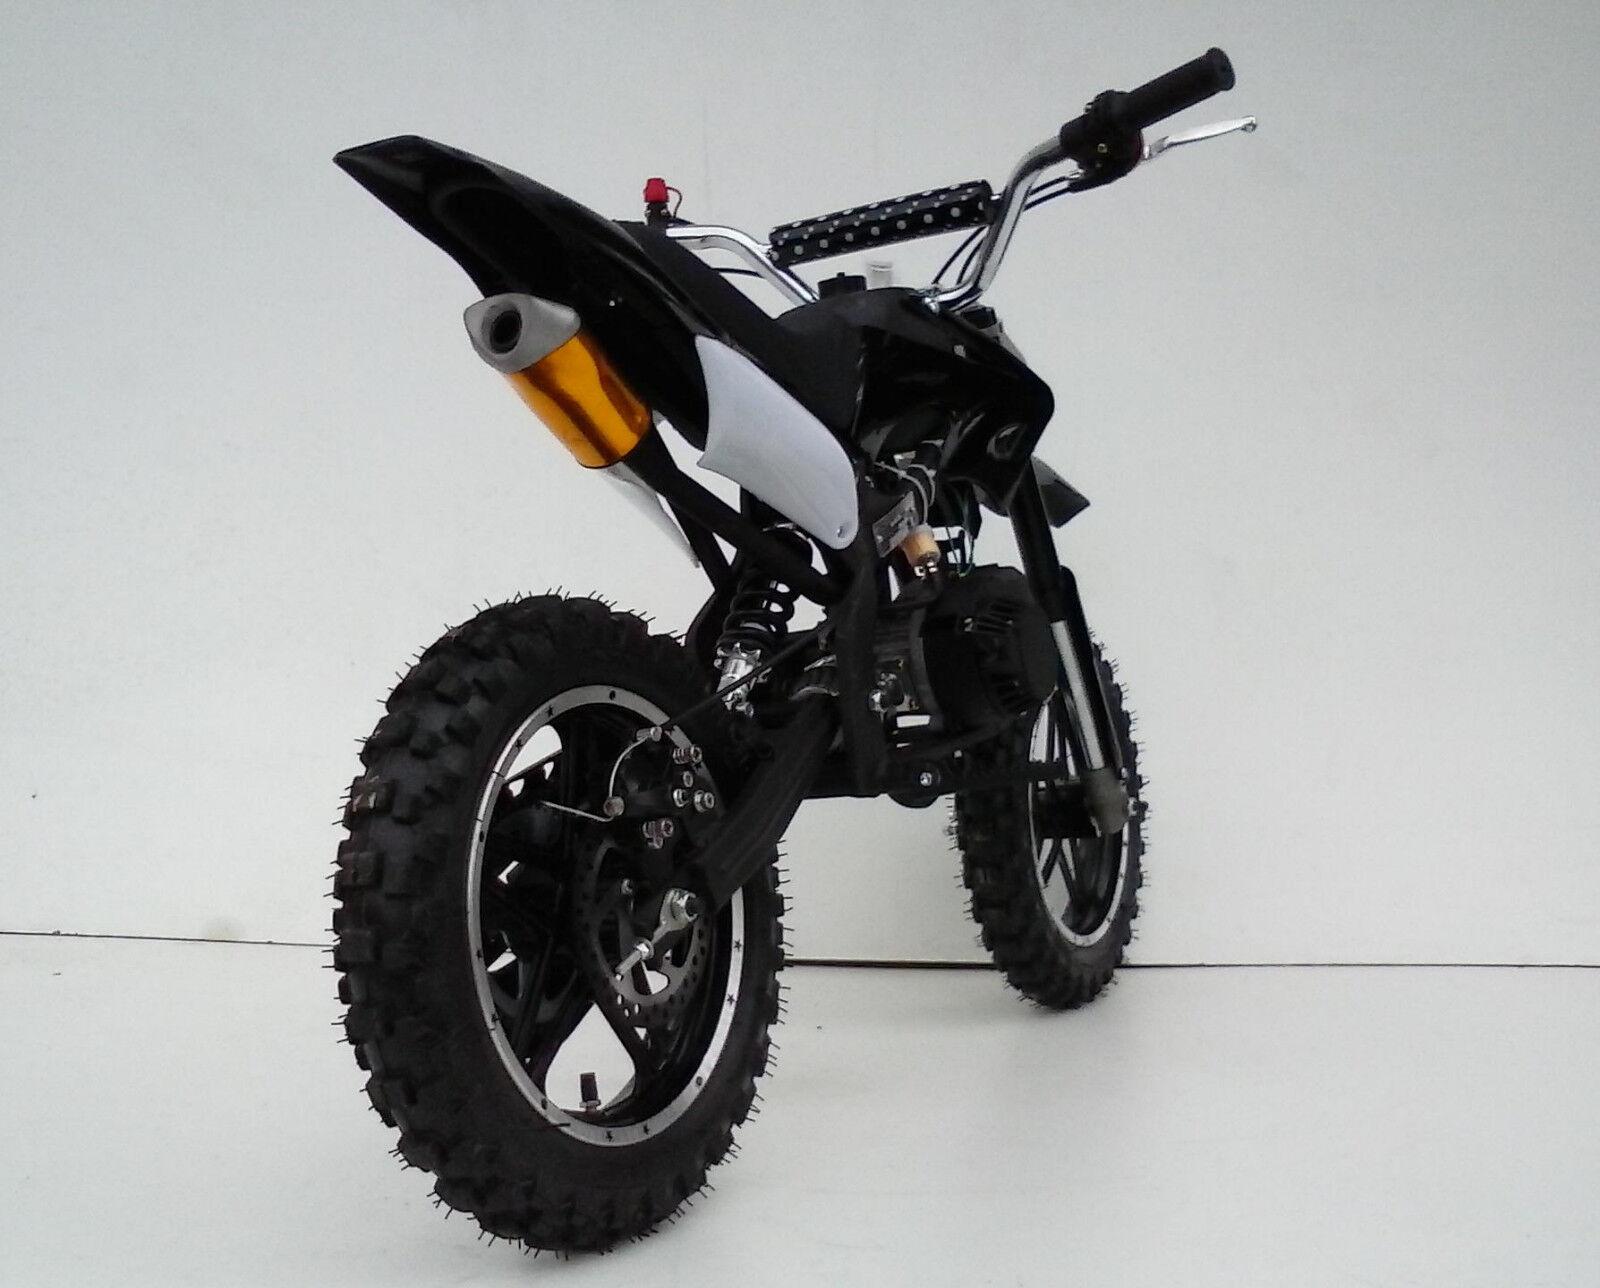 cross bike tuning tuningvergaser crossbike pocketbike dirtbike pocket dirt 49ccm ebay. Black Bedroom Furniture Sets. Home Design Ideas